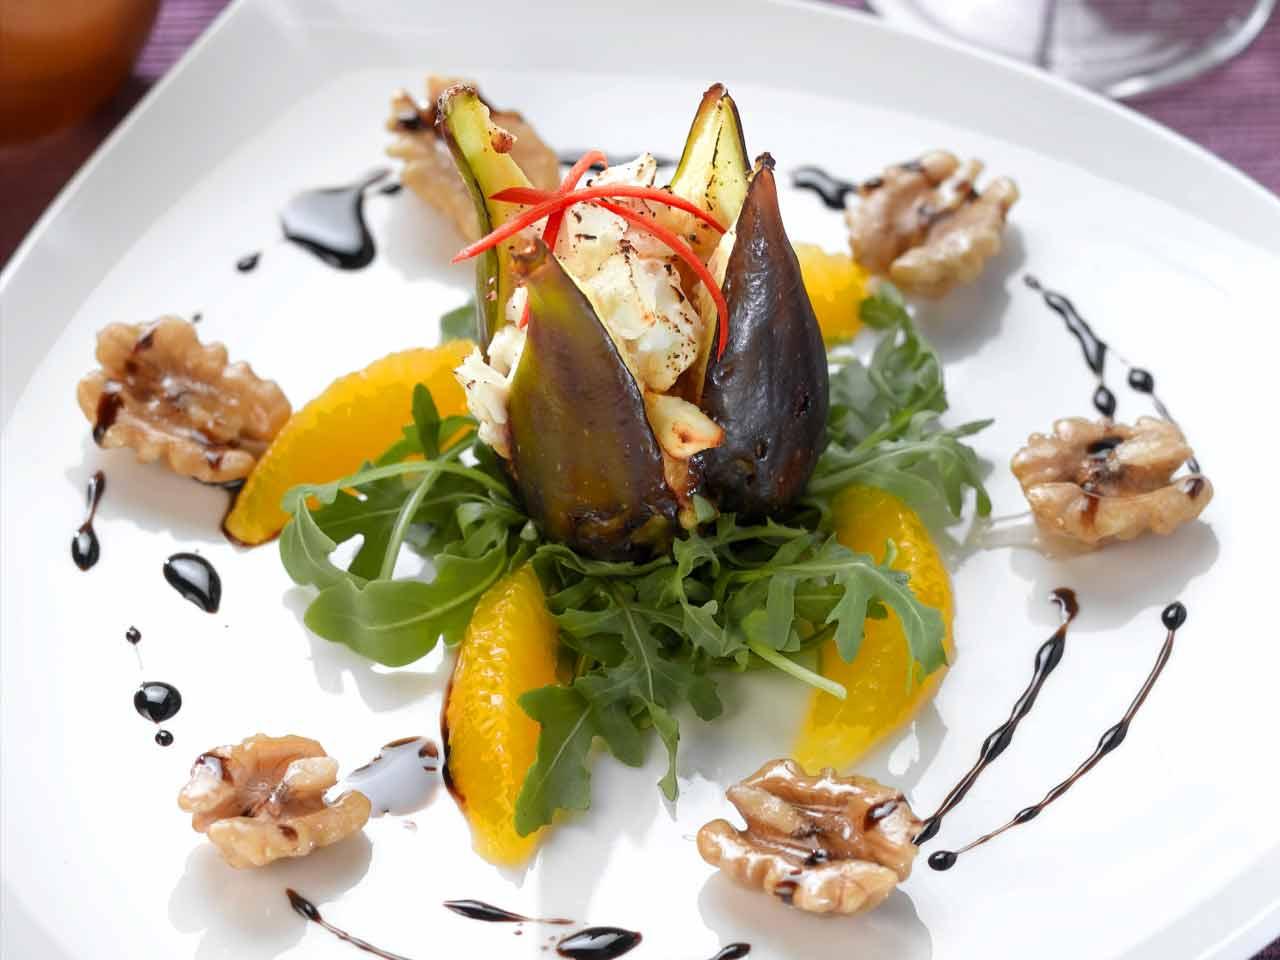 Festive figs with feta